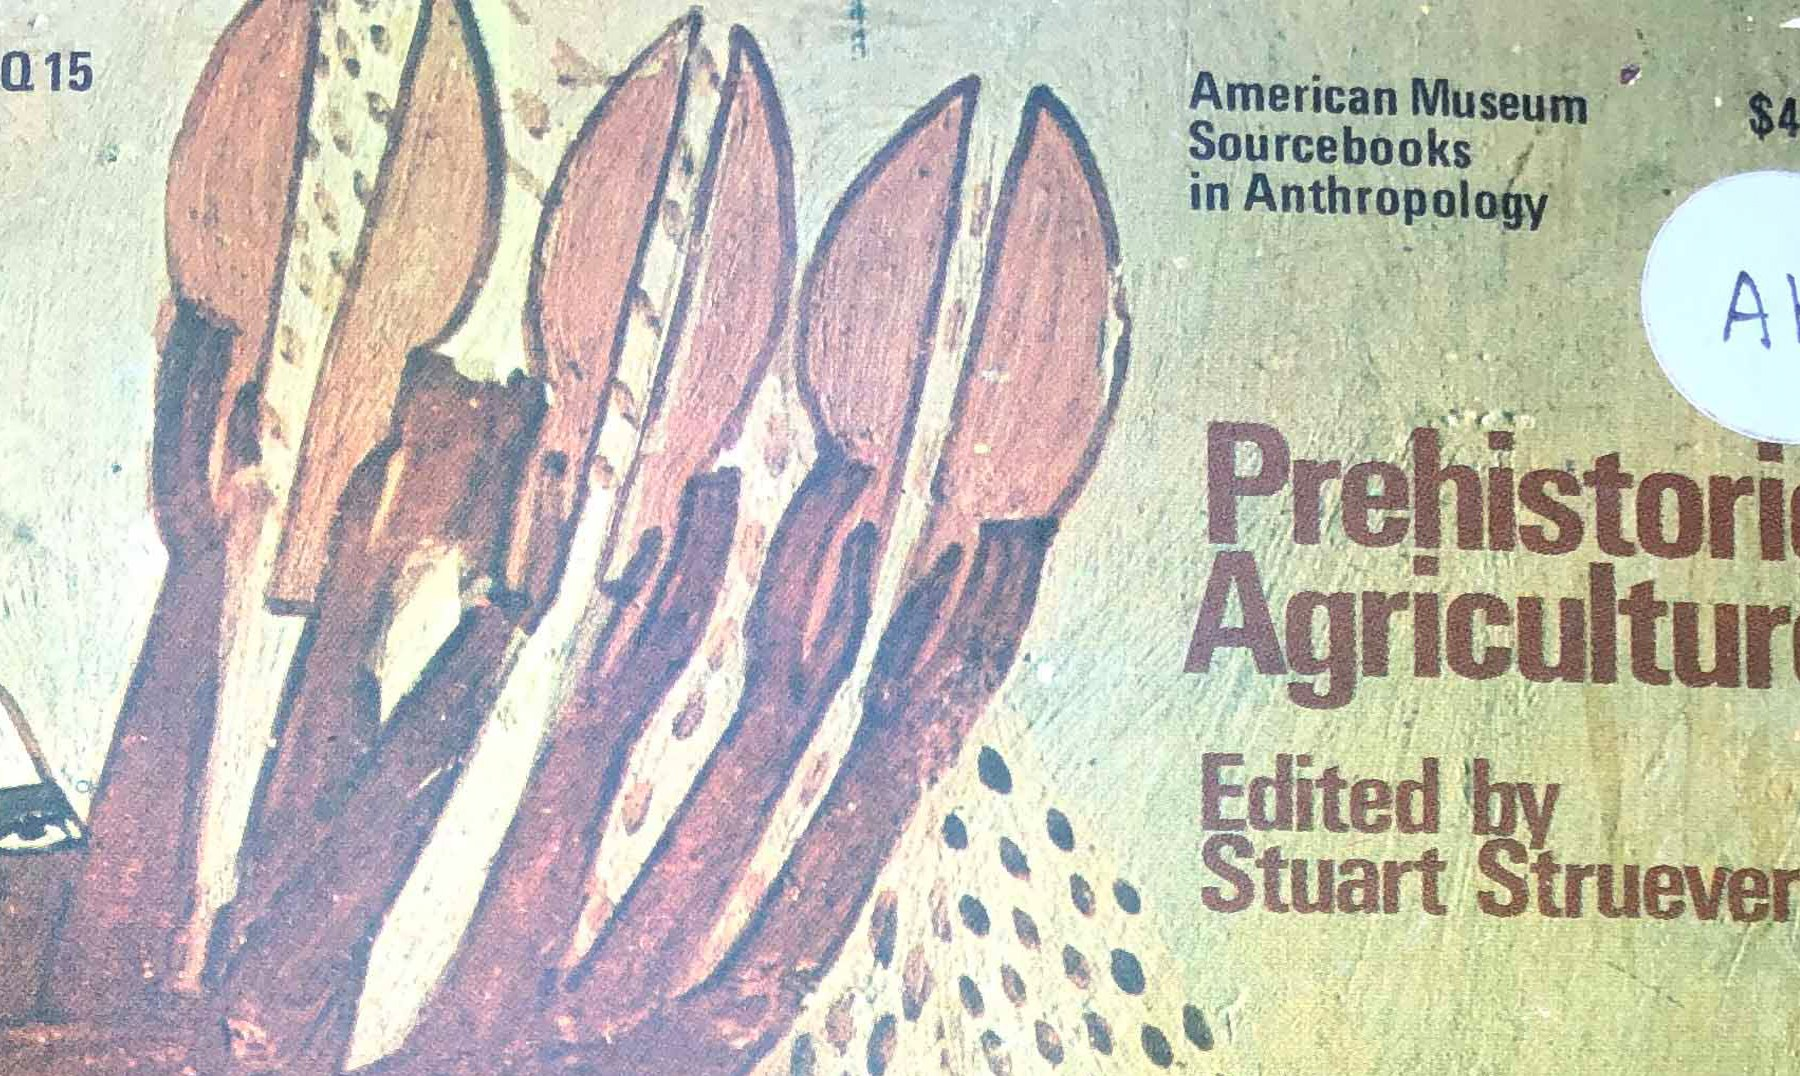 Prehistoric Agricultur Edited by Stuart Struever